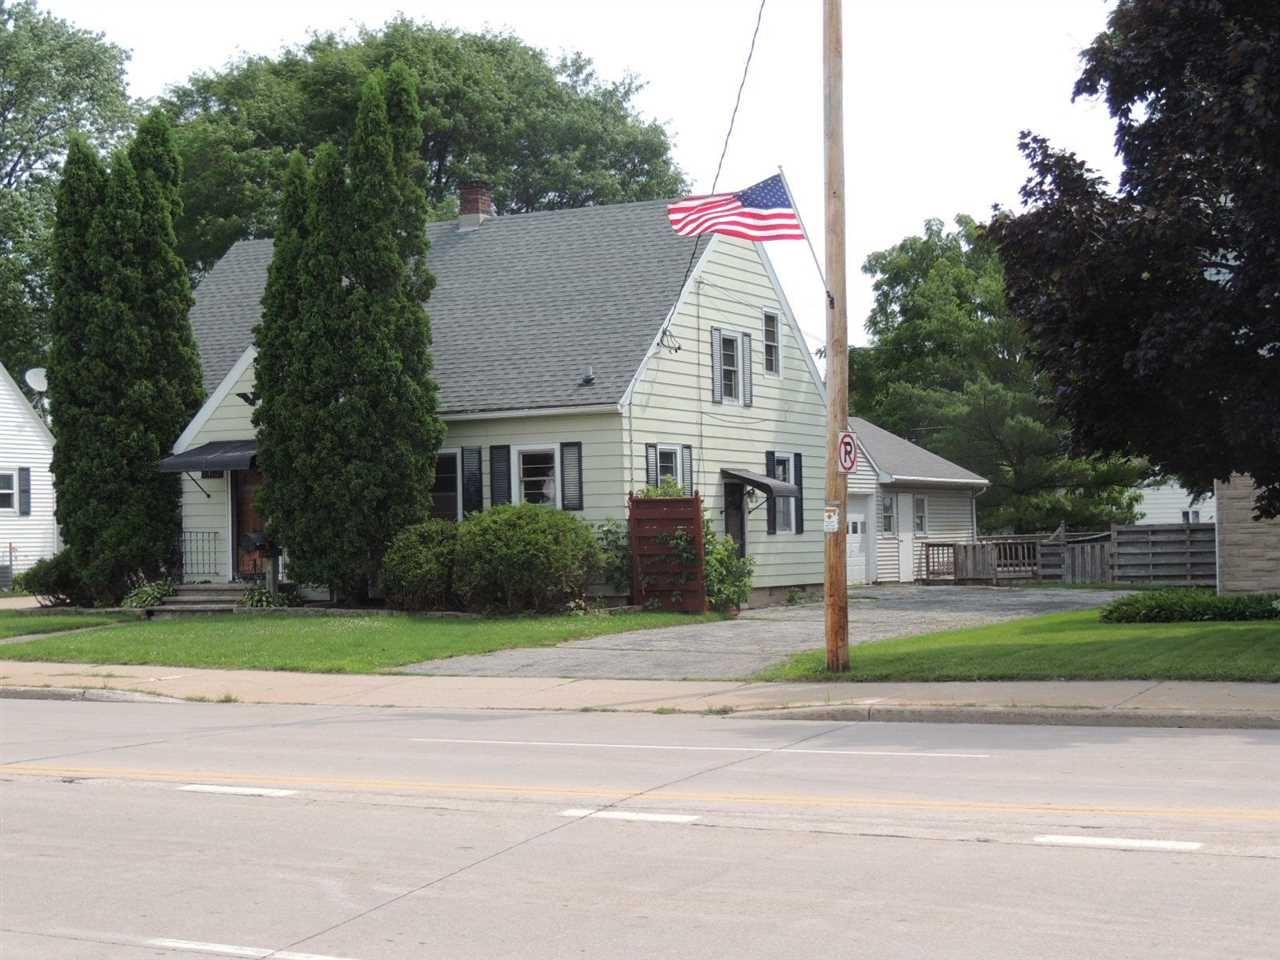 Photo of 2102 N RICHMOND Street, APPLETON, WI 54911 (MLS # 50244138)